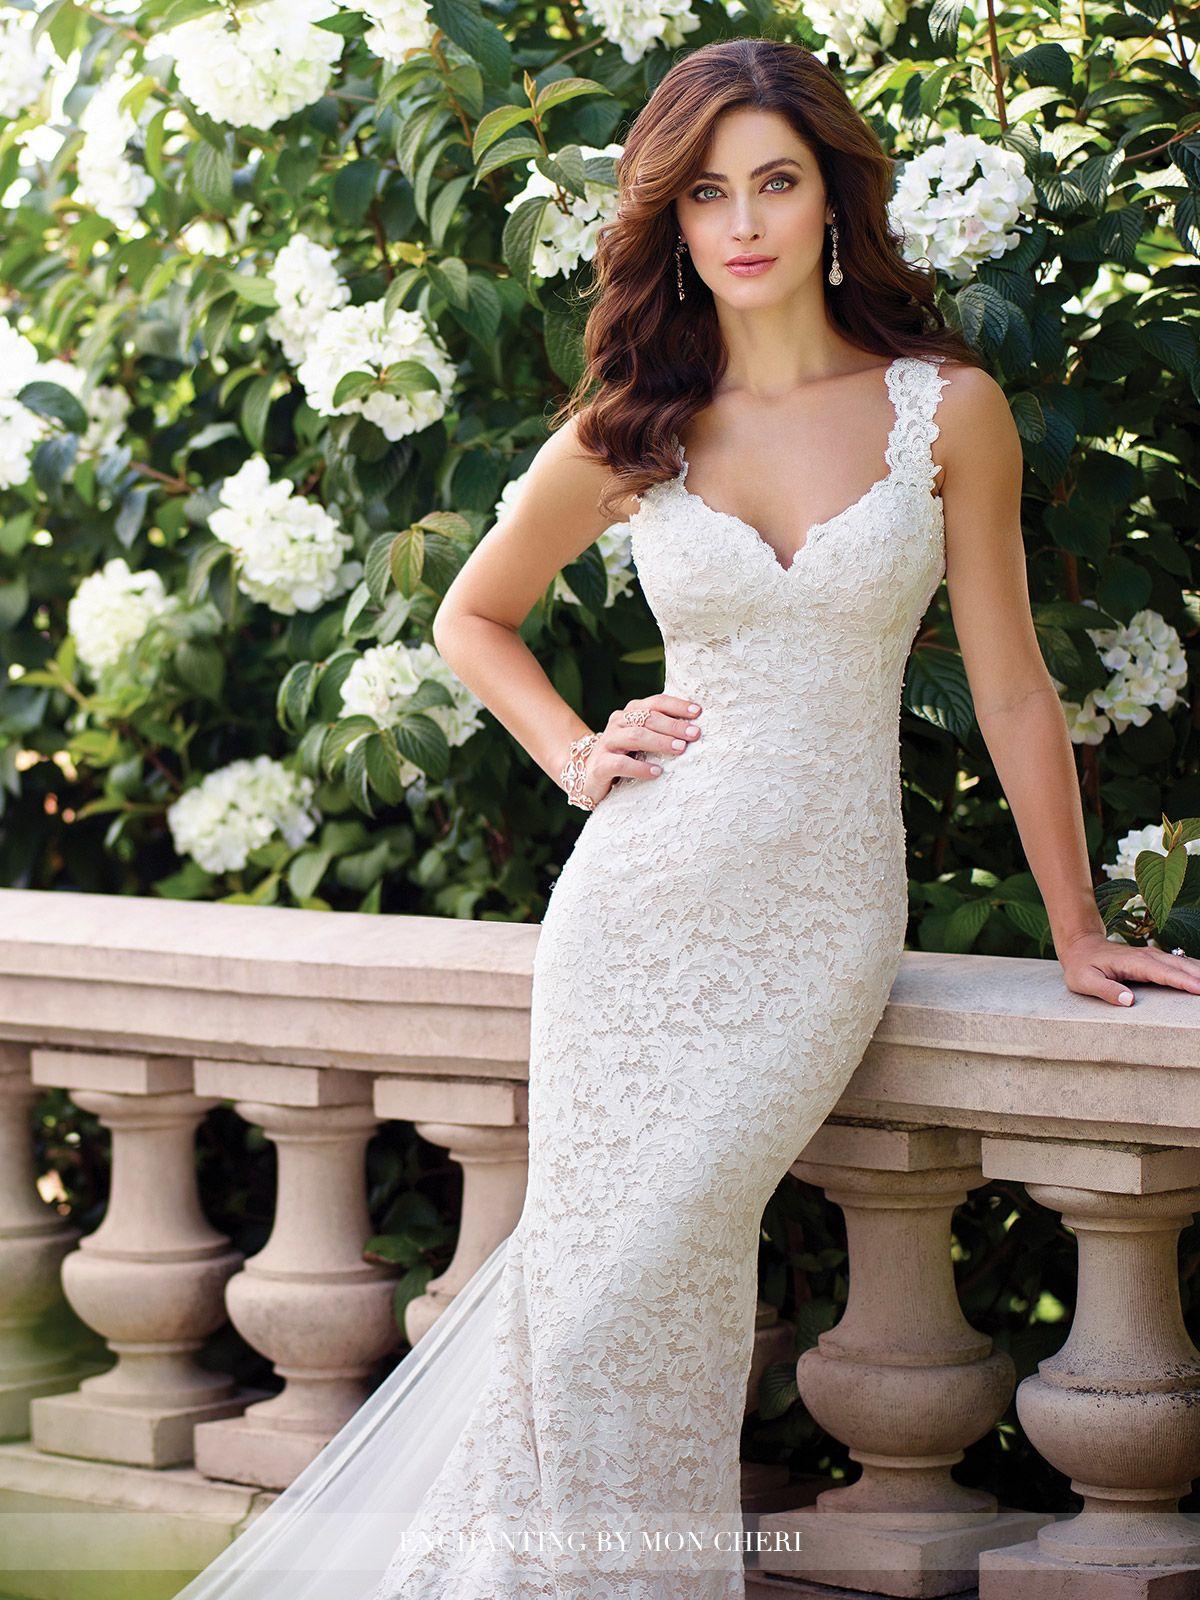 Sleeveless chiffon wedding dress enchanting by mon cheri